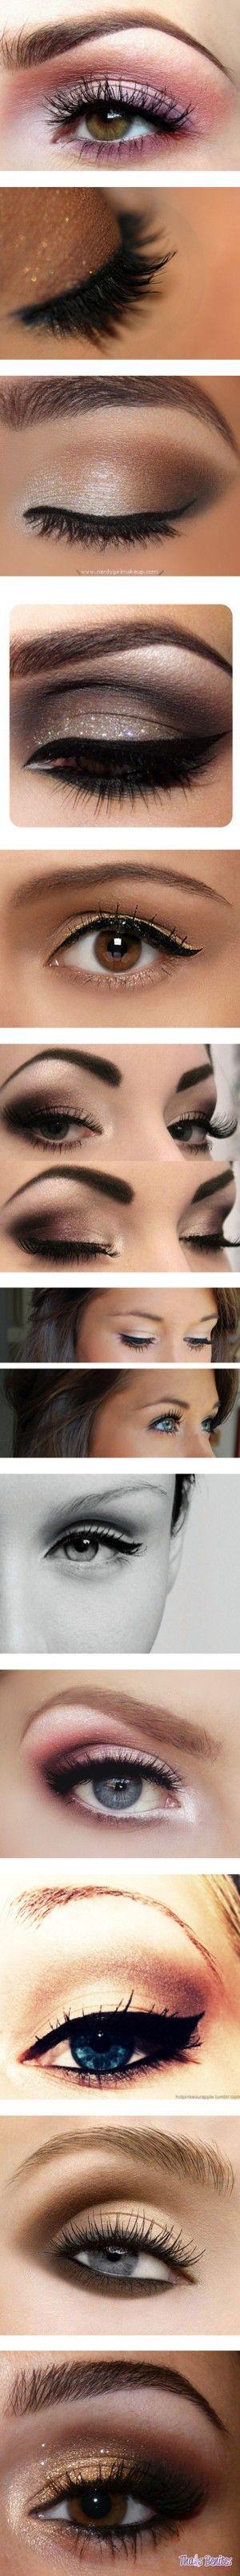 eye makeup and eyelashes for days